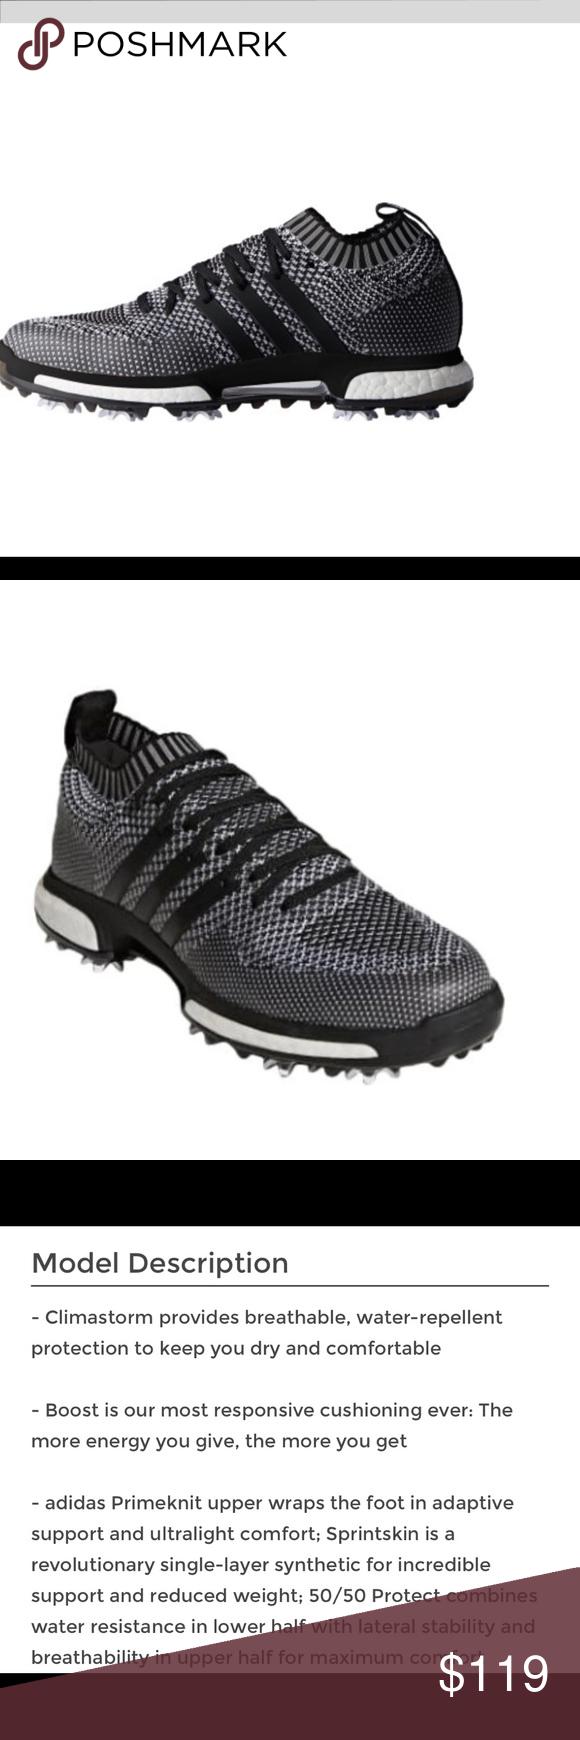 22+ Adidas 360 primeknit golf shoes viral